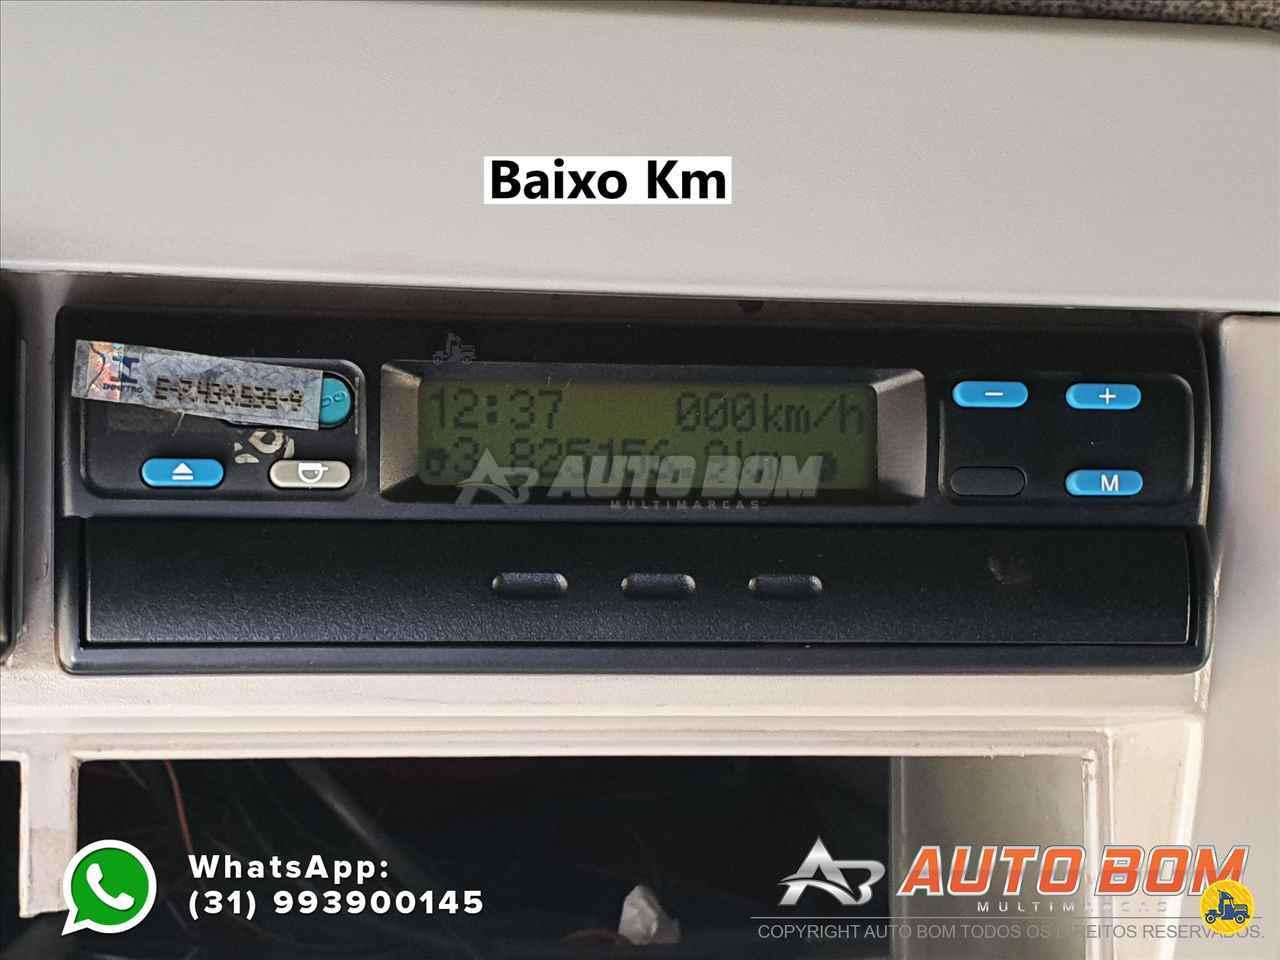 IVECO STRALIS 410 169890km 2010/2011 Autobom Multimarcas